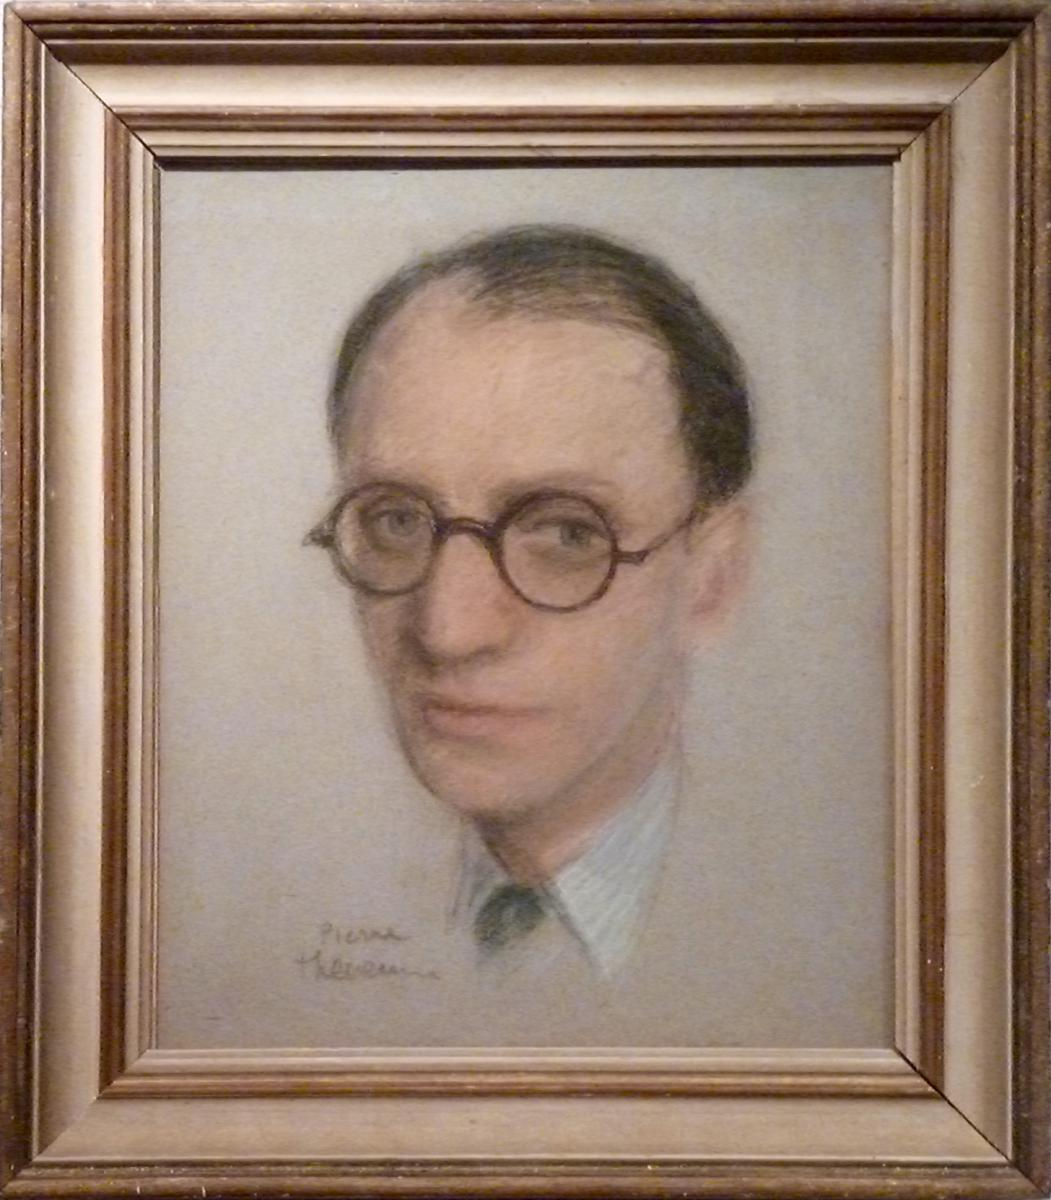 Man With Pastel Glasses Round Pierre Thevenin (1905-1950